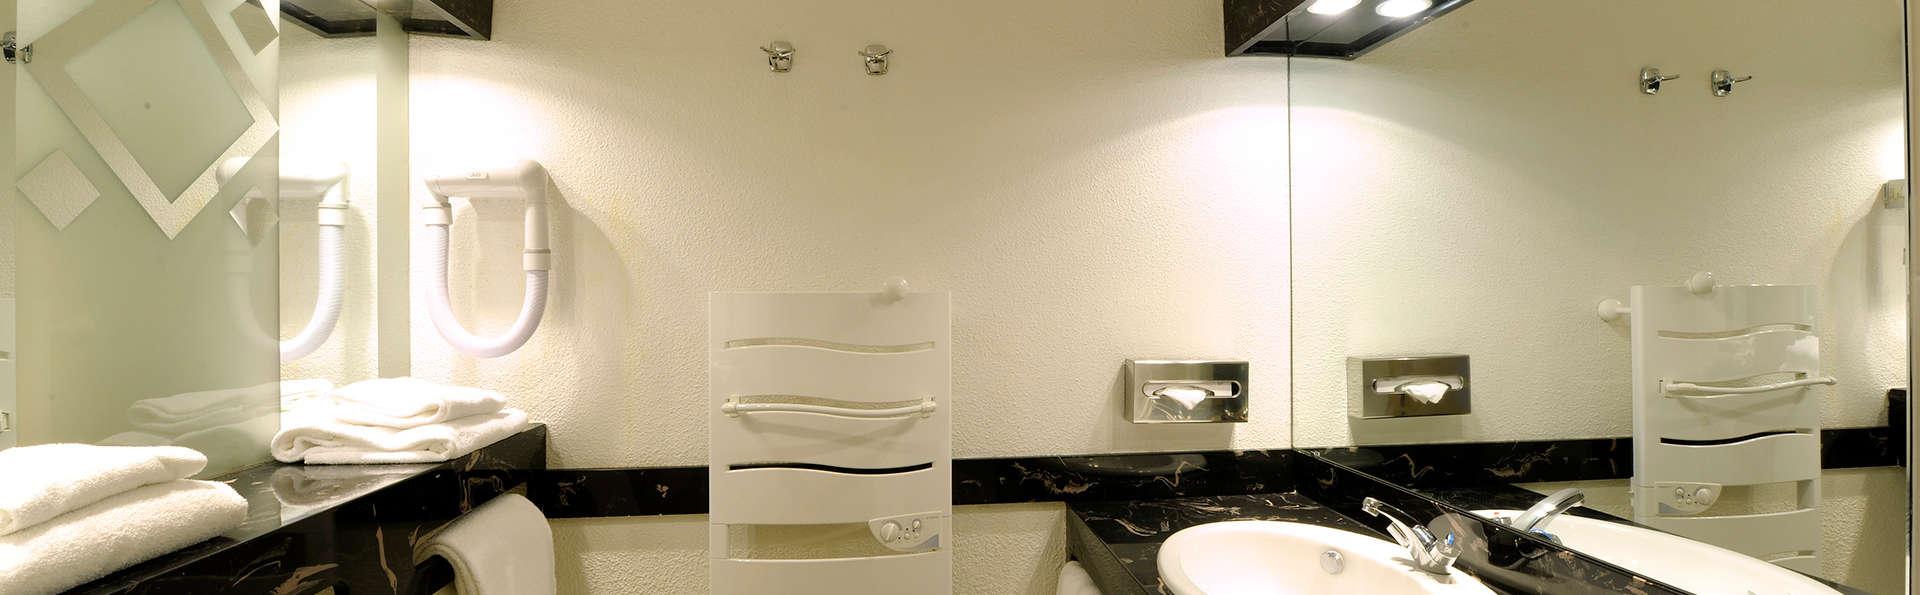 Hôtel Mercure Les Deux Alpes 1800 - Edit_Bathroom.jpg